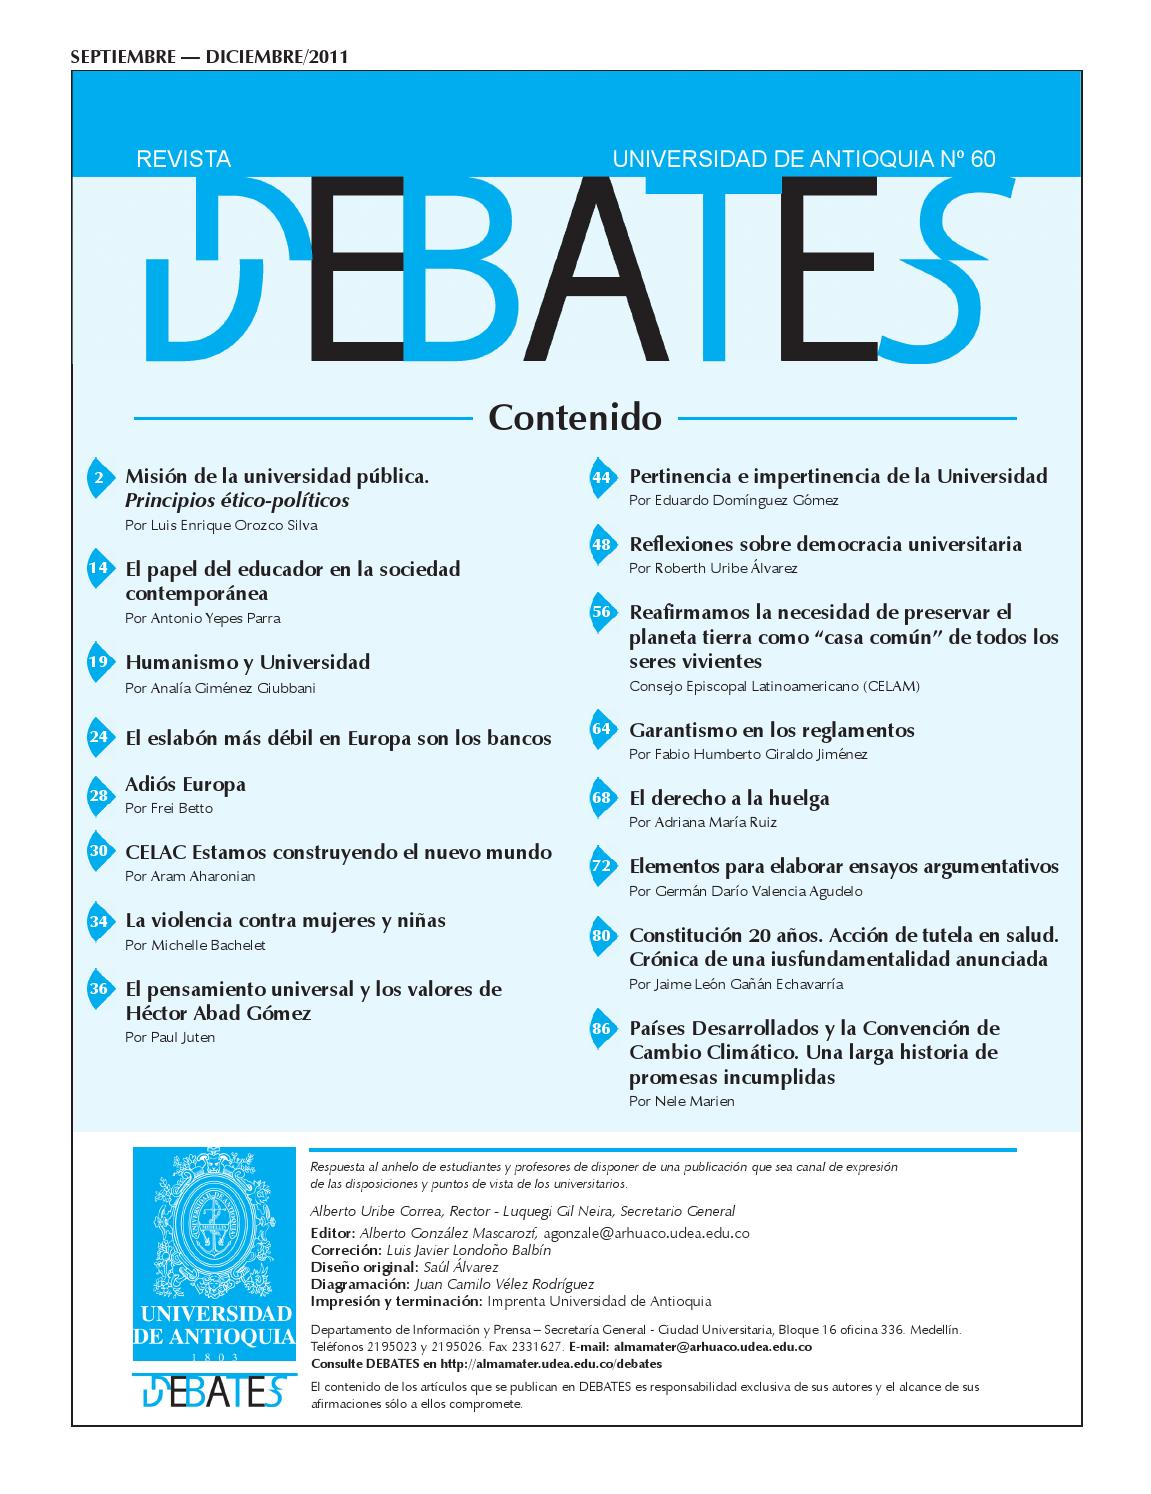 REVISTA N° 60 by Universidad de Antioquia - issuu